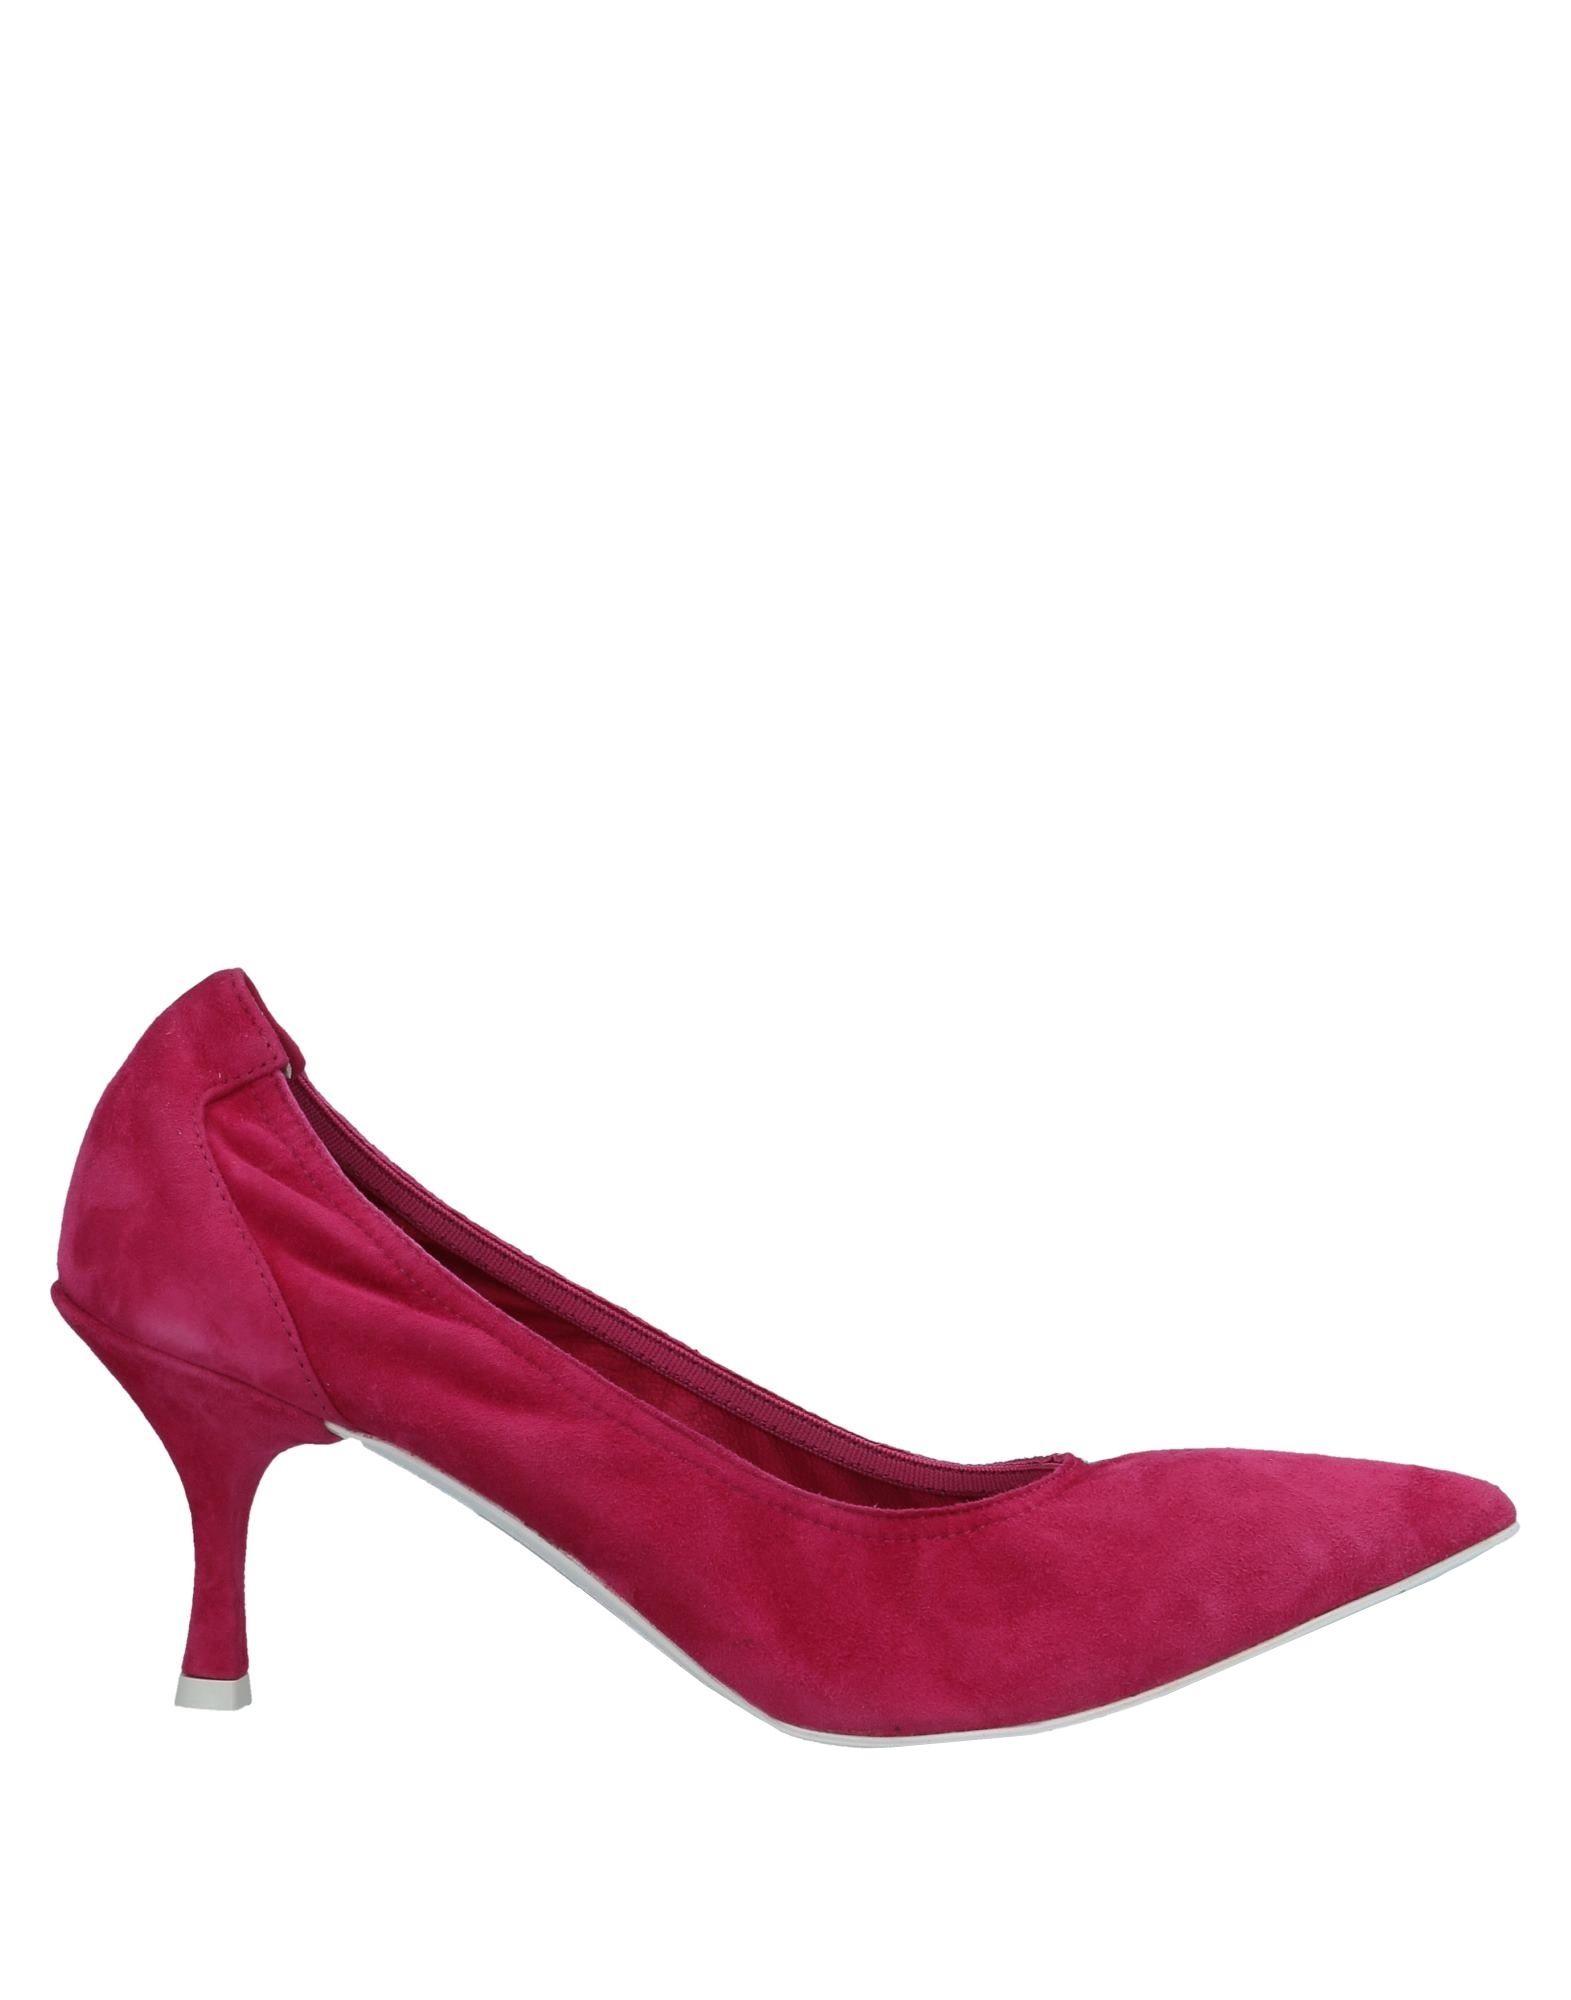 Status Pumps Damen  11548146QA Gute Qualität beliebte Schuhe